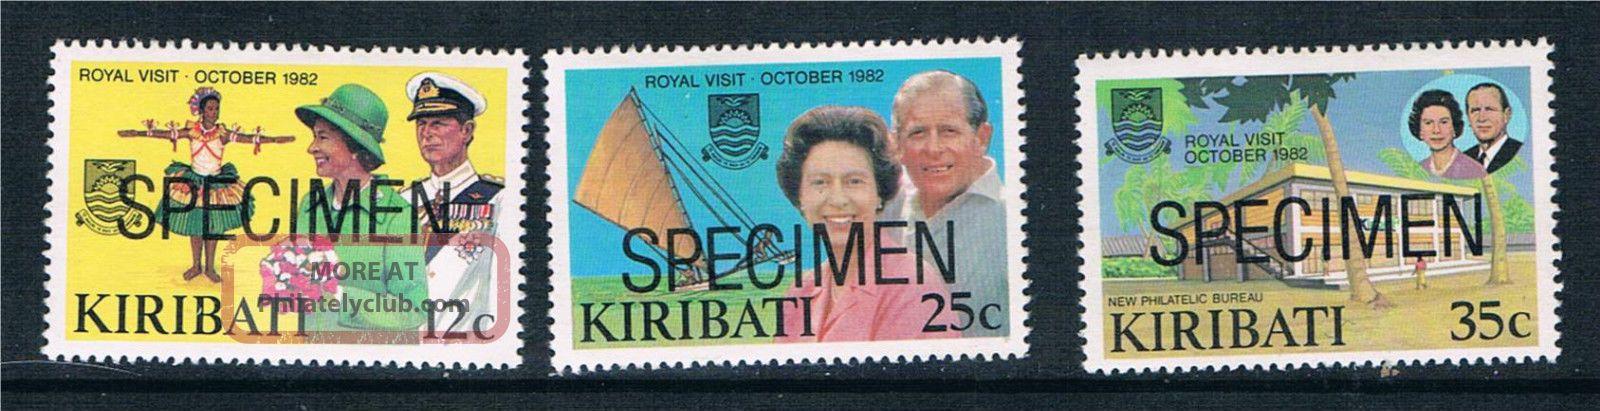 Kiribati 1982 Royal Visit Specimen Sg193/5 Australia & Oceania photo